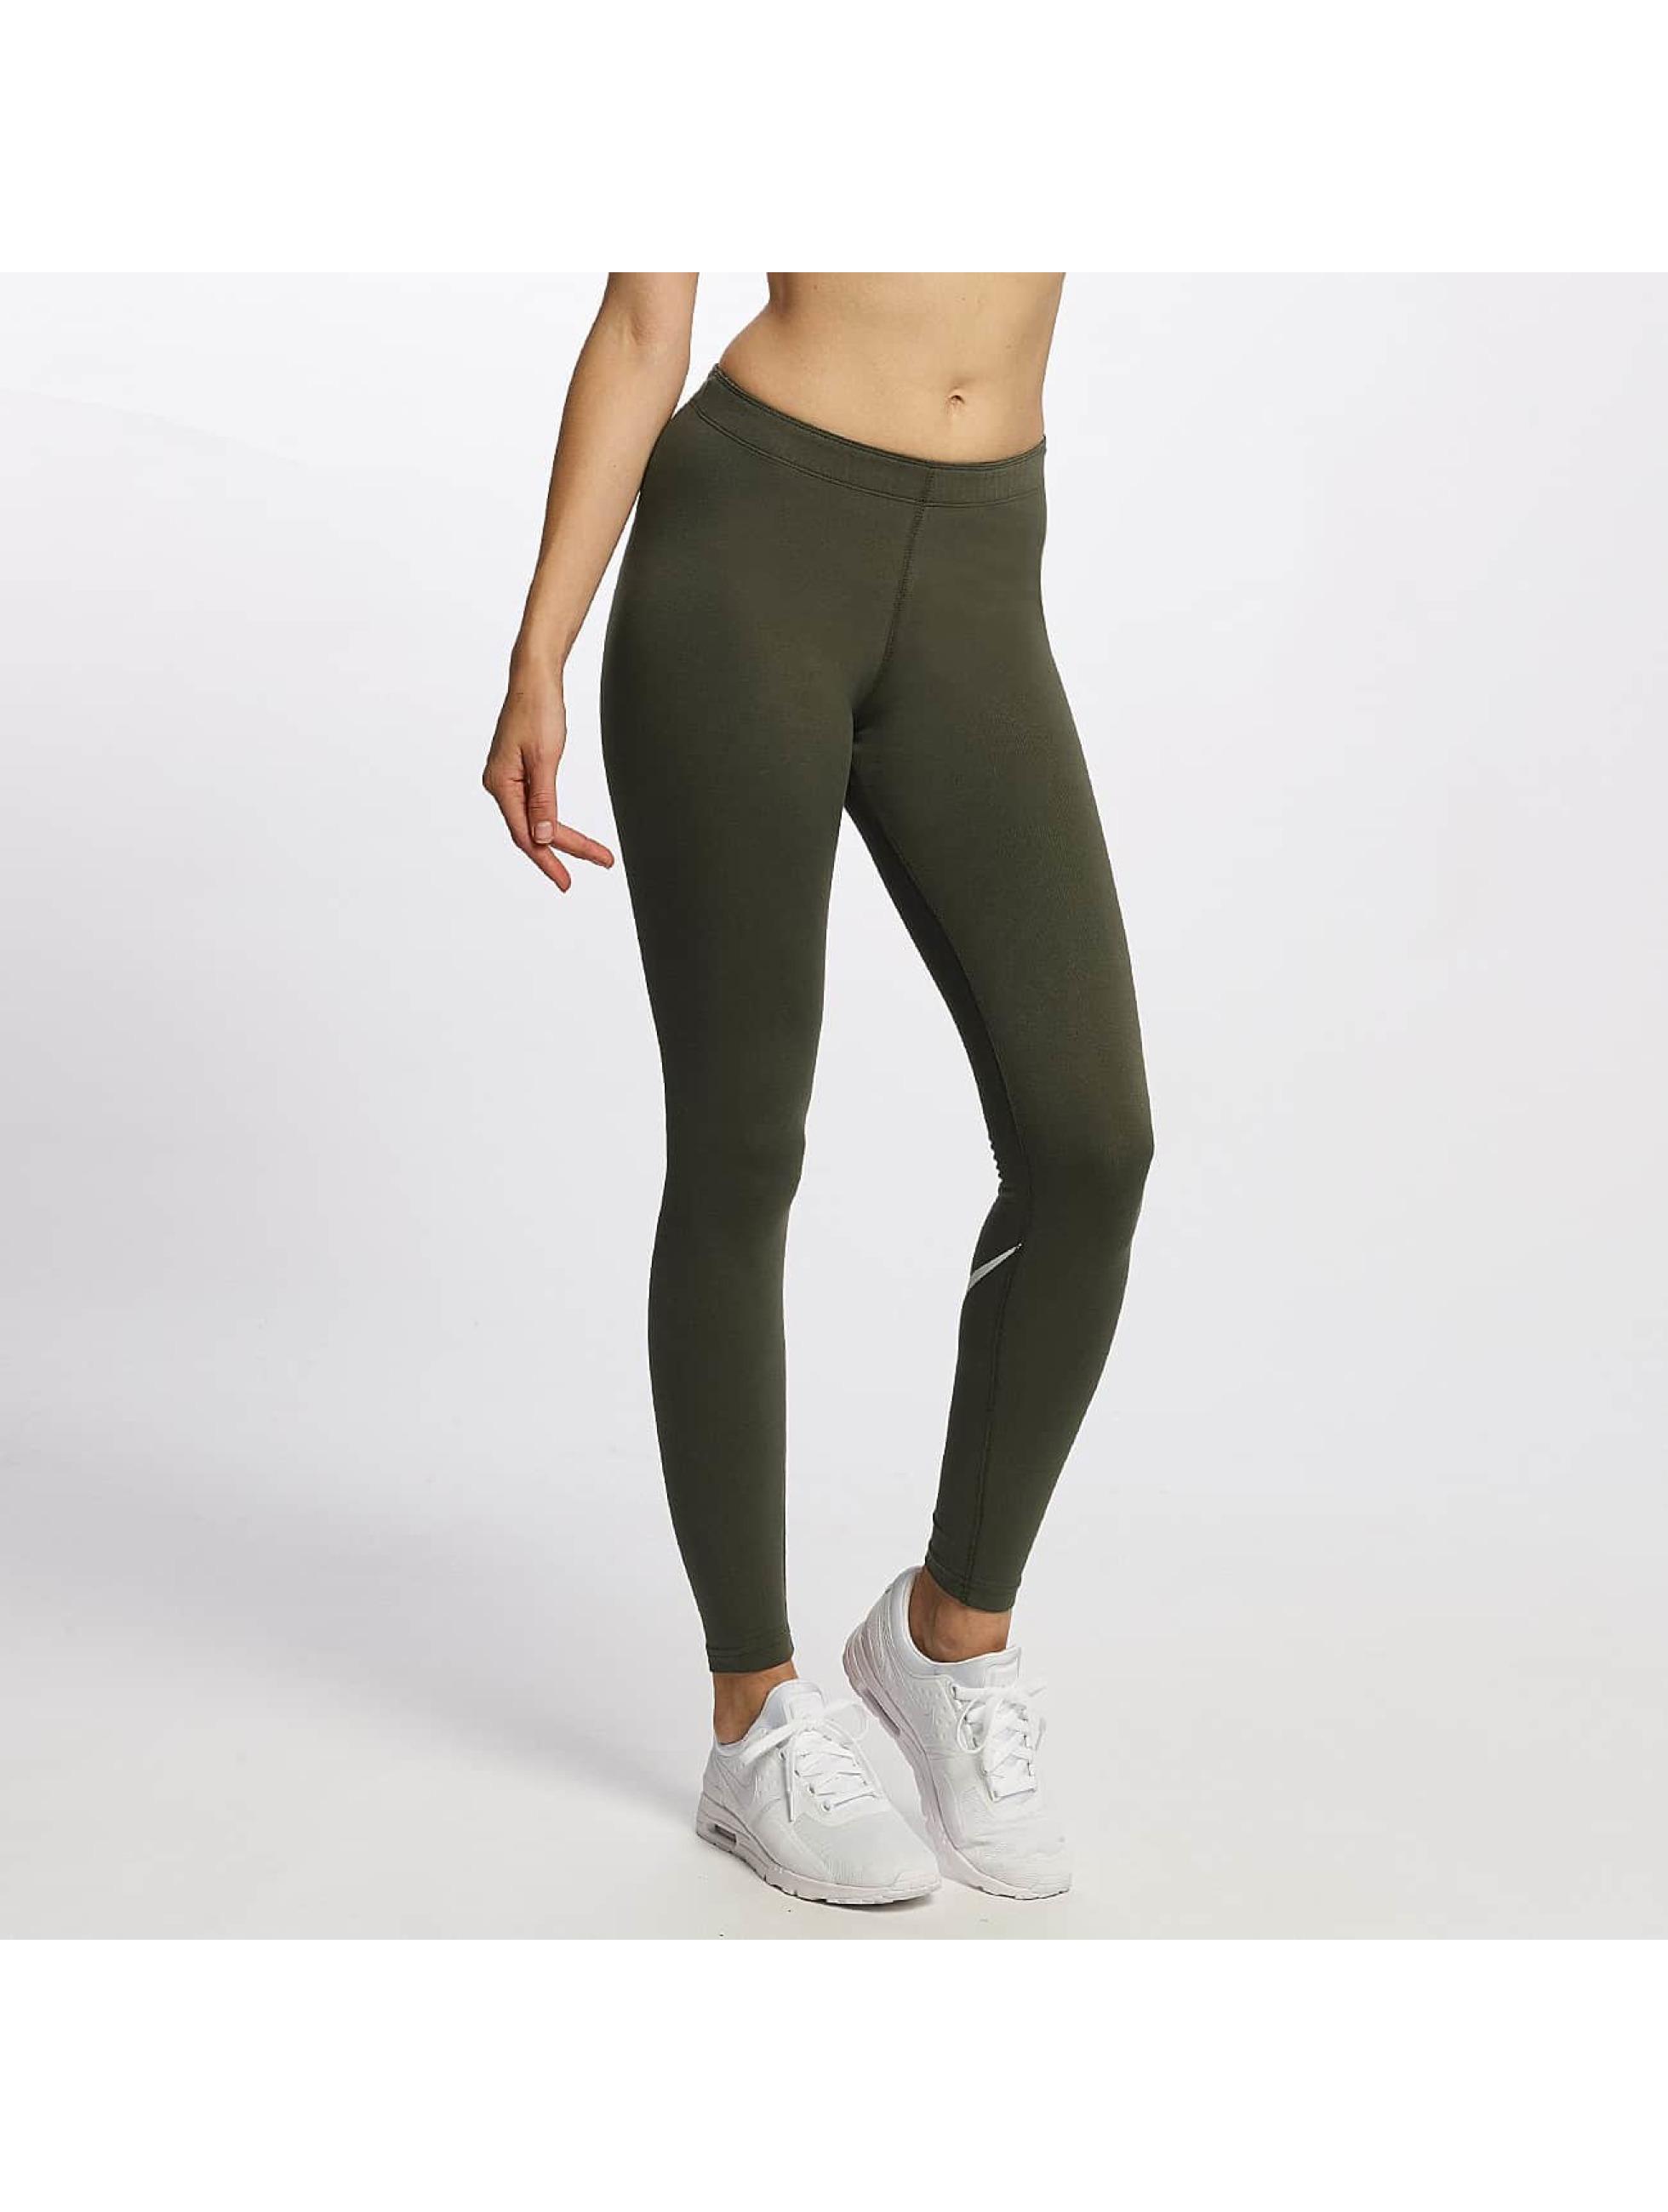 Nike Frauen Legging Leg-A-See Logo in khaki